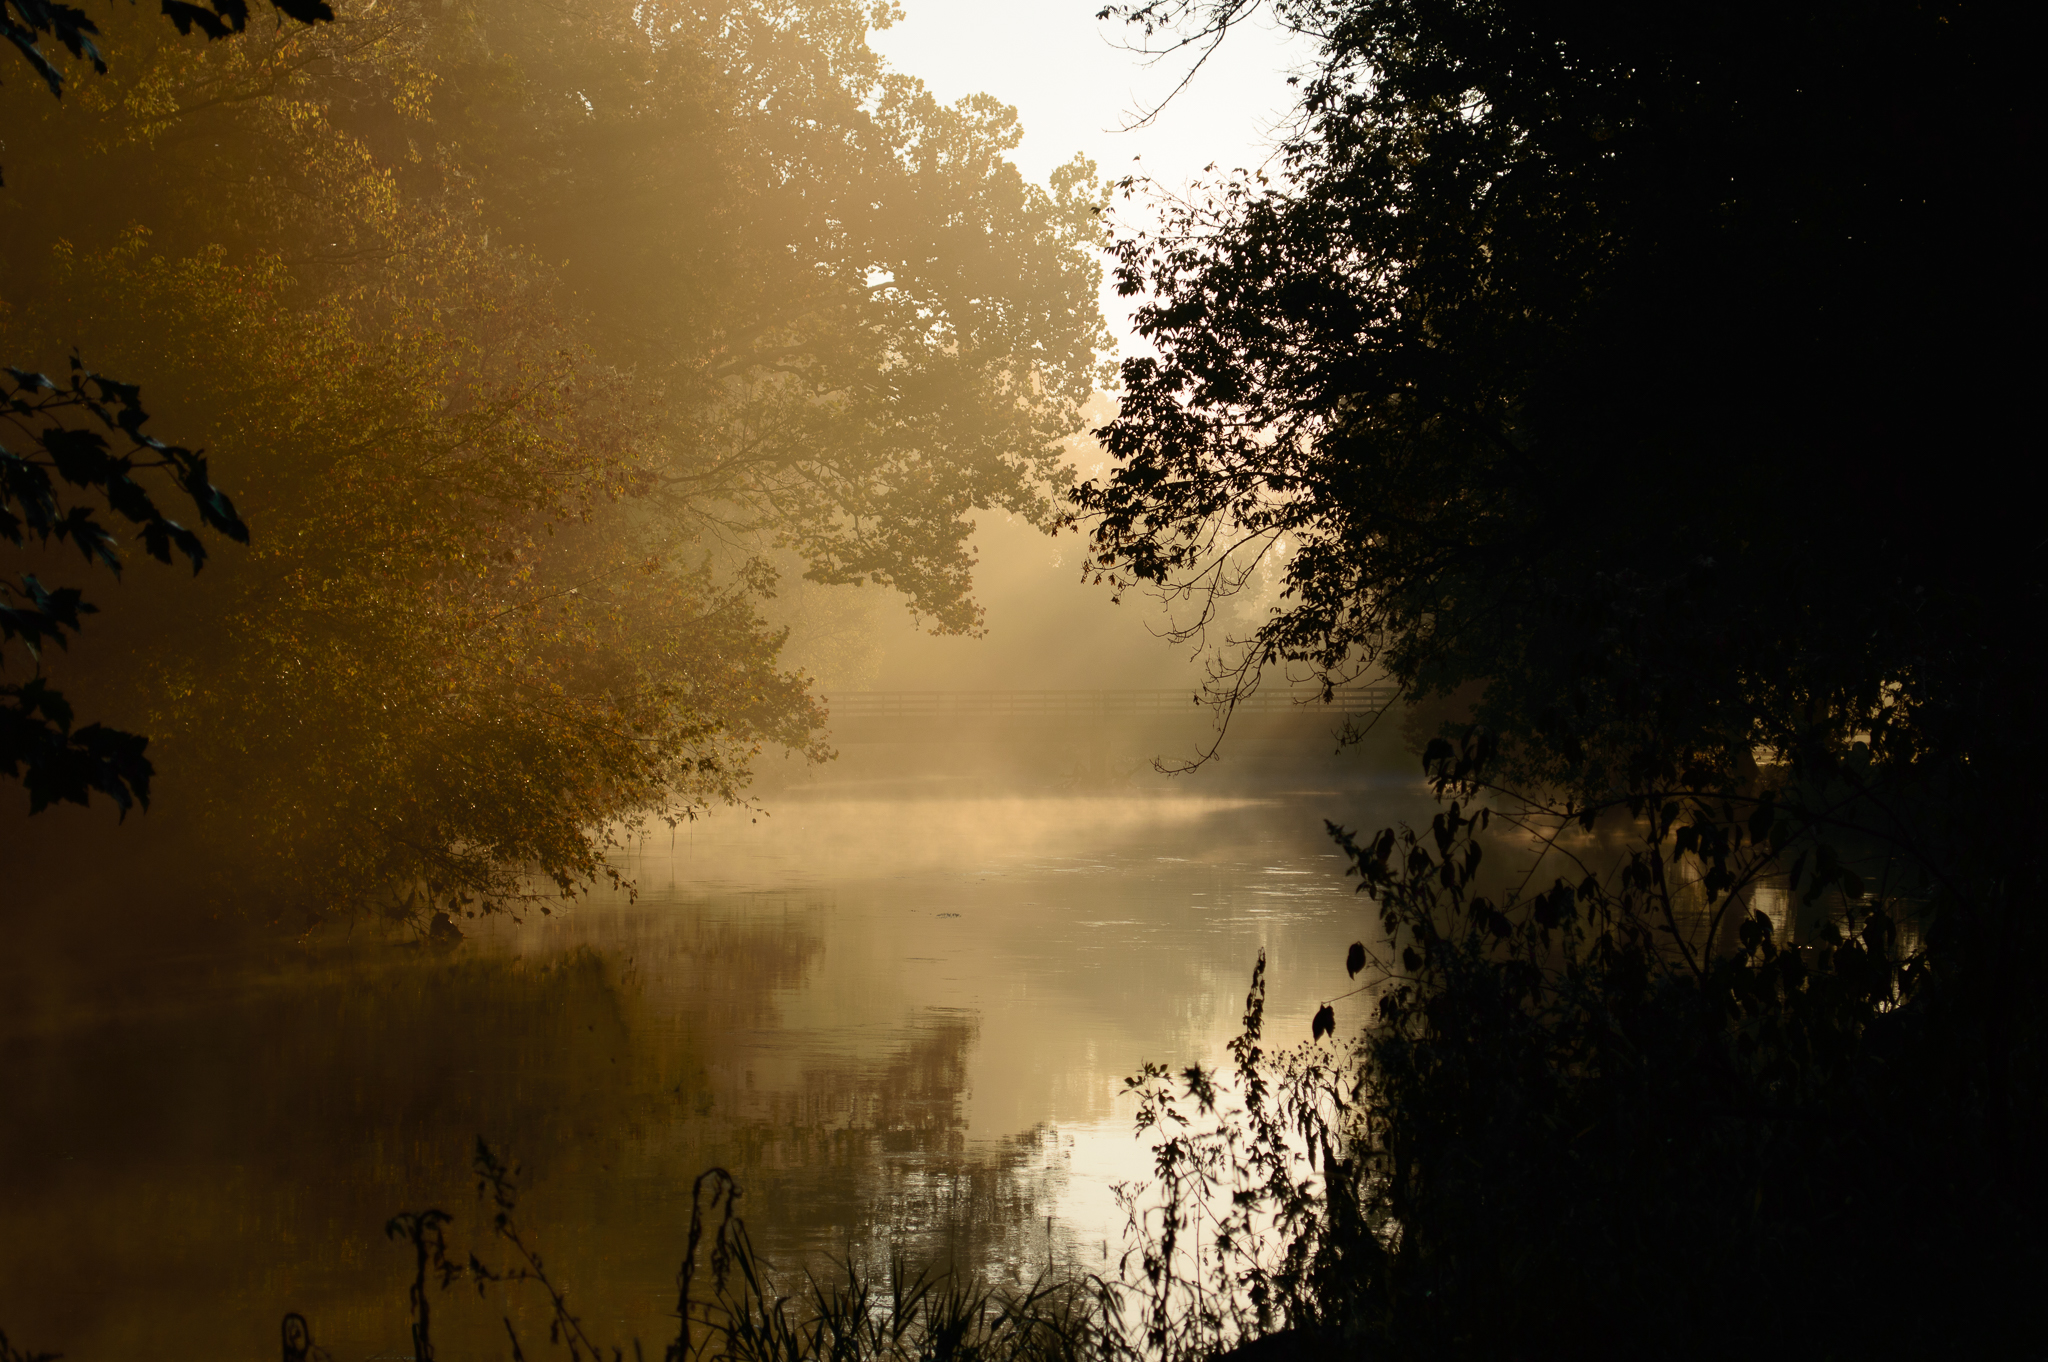 Conestoga River Photo Essay – Introduction